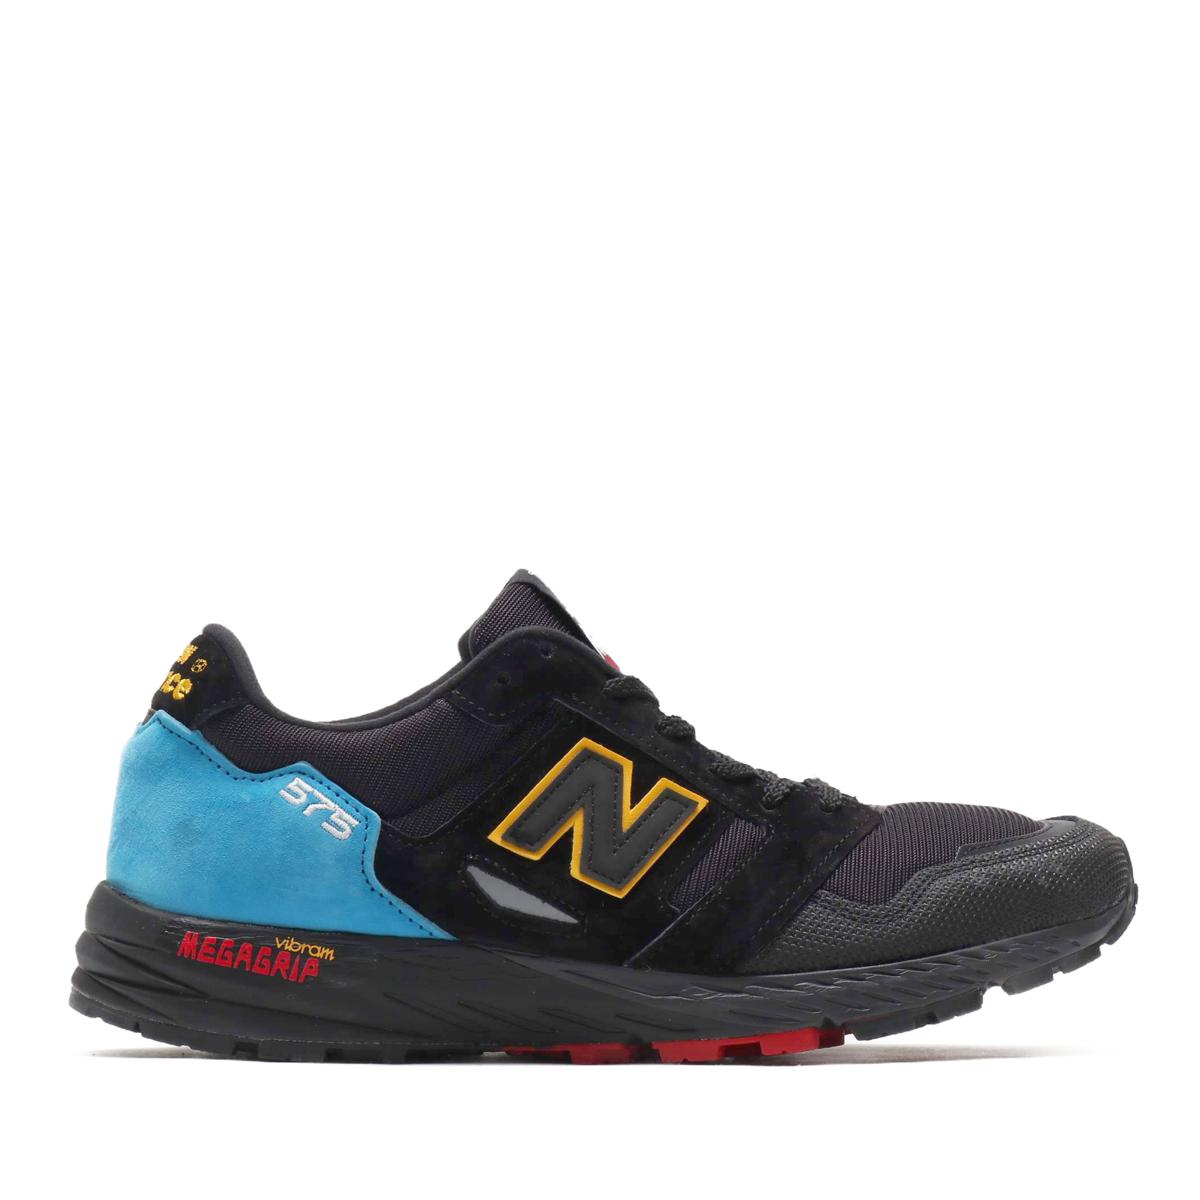 New Balance MTL575UT(BLACK/BLUE)(ニューバランス MTL575UT)【メンズ】【スニーカー】【19FW-I】